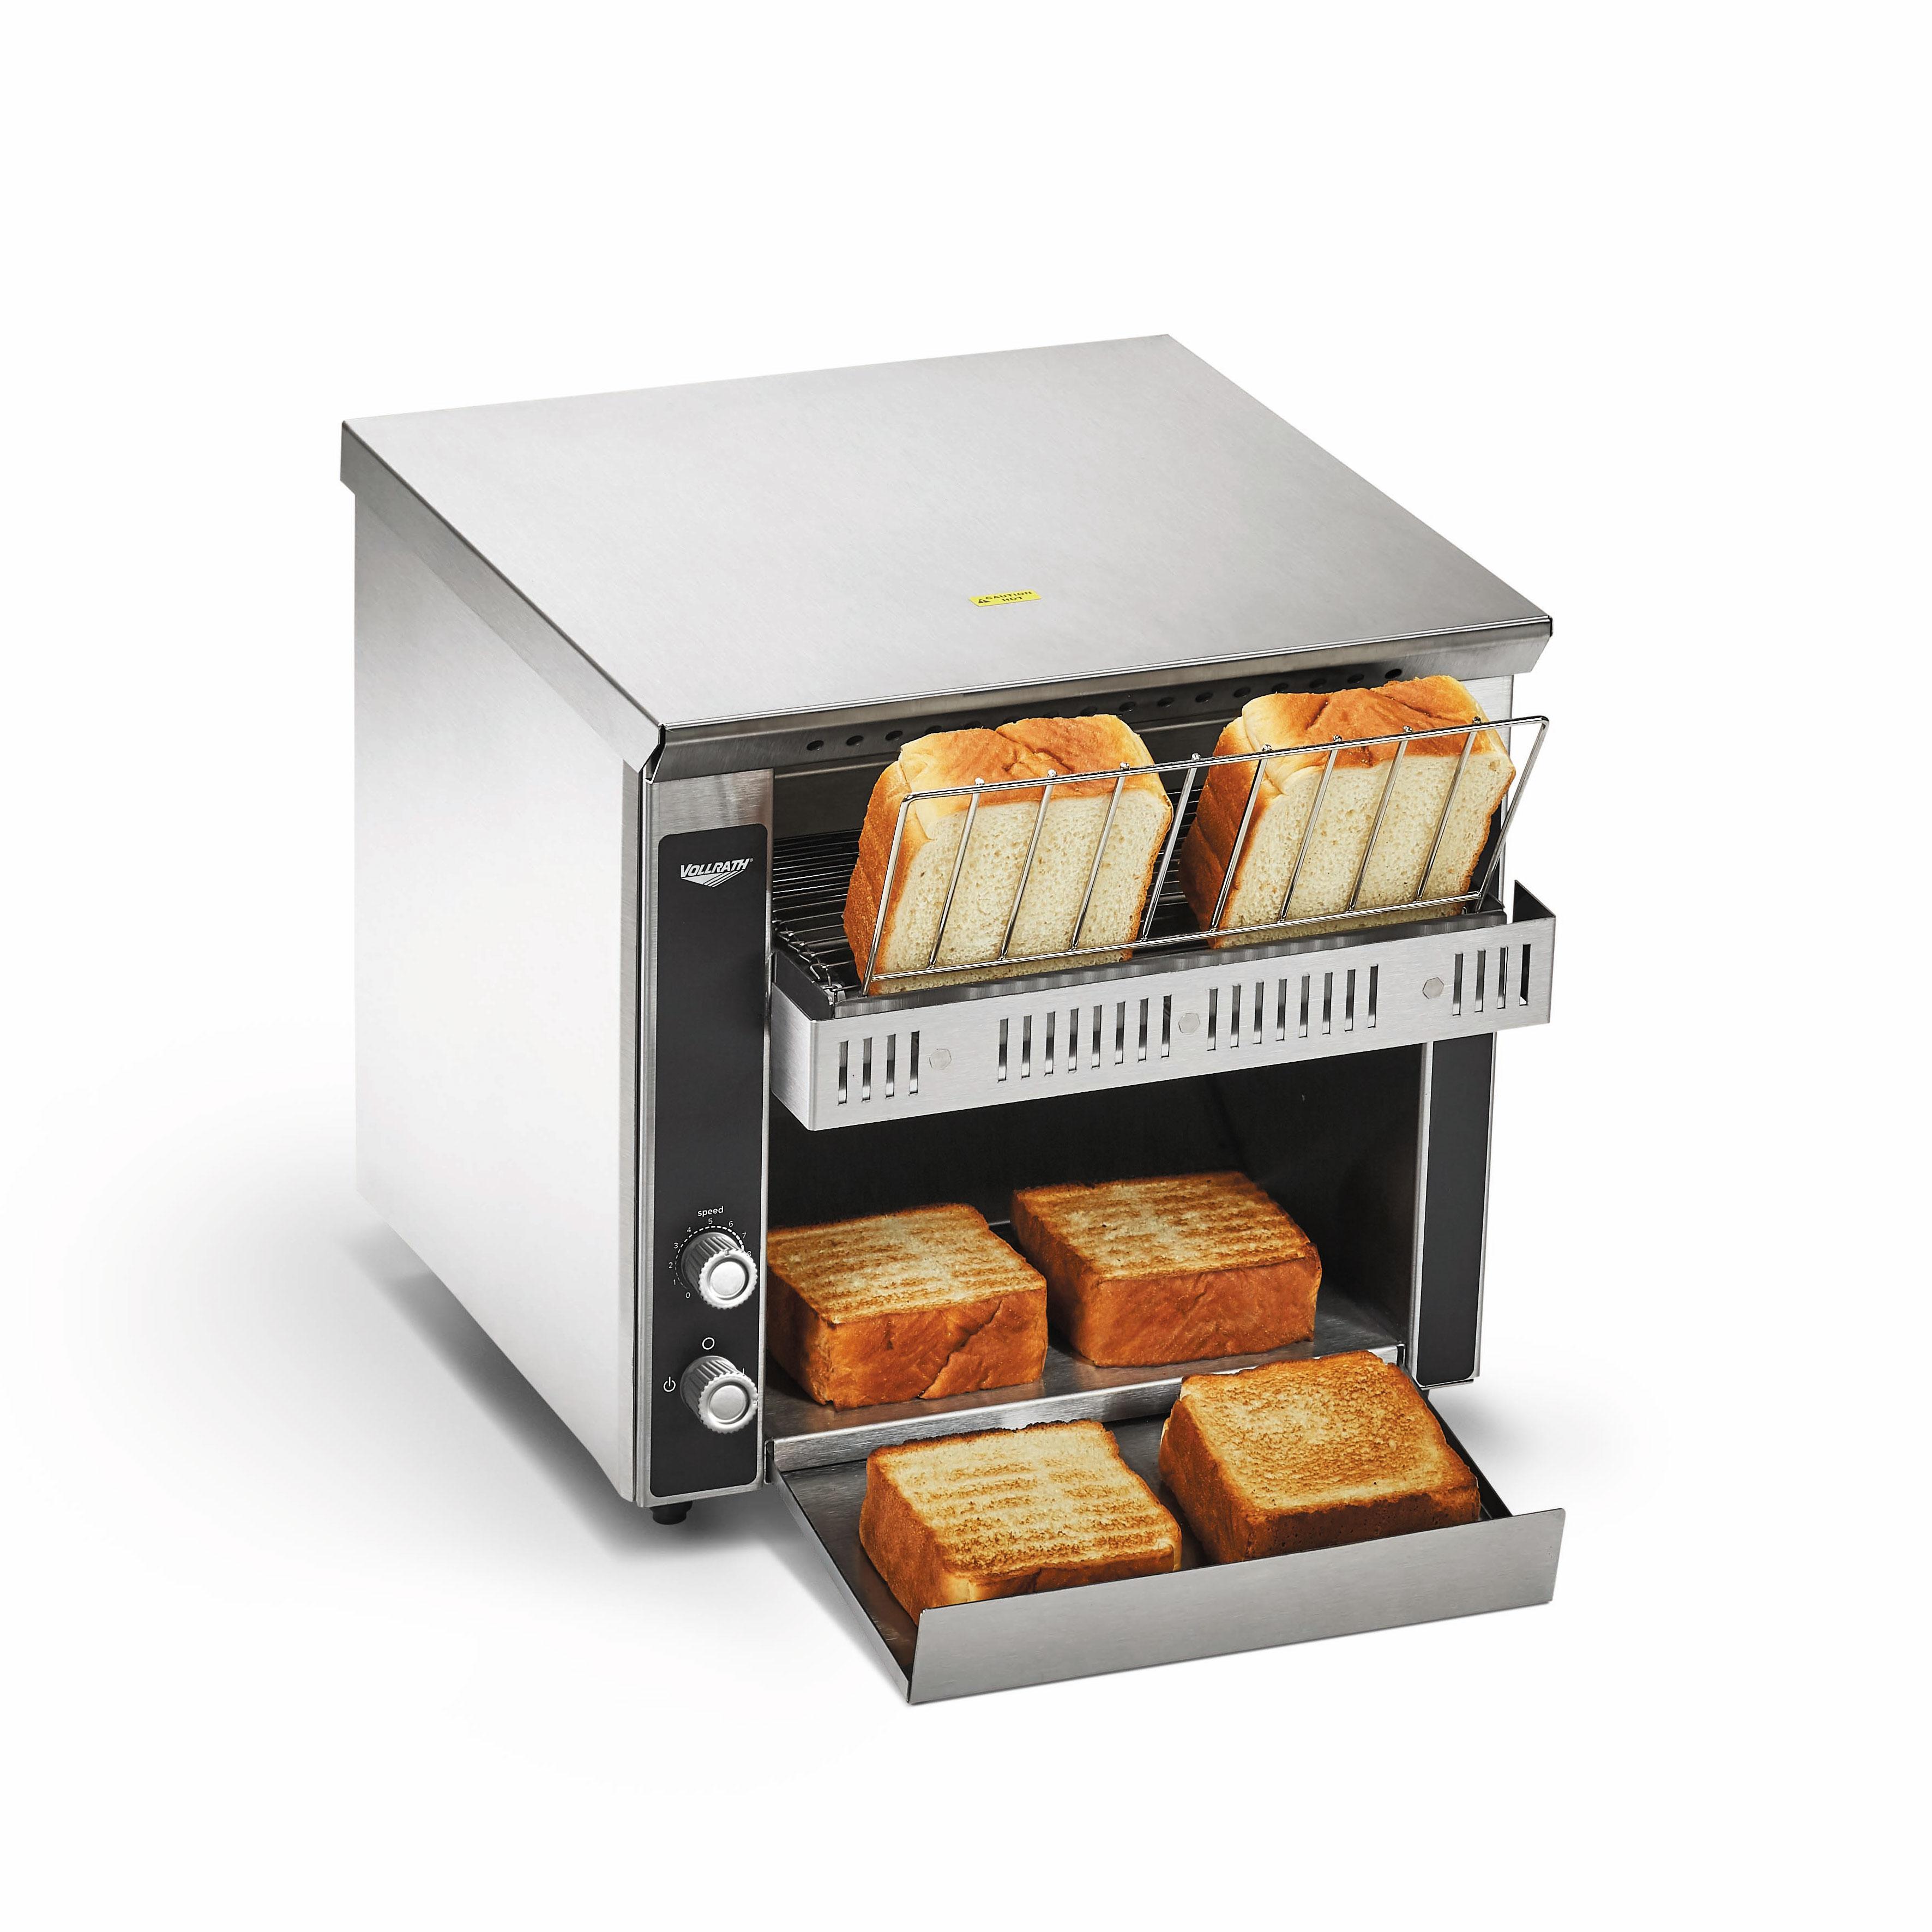 CT2H-120250 Vollrath toaster, conveyor type